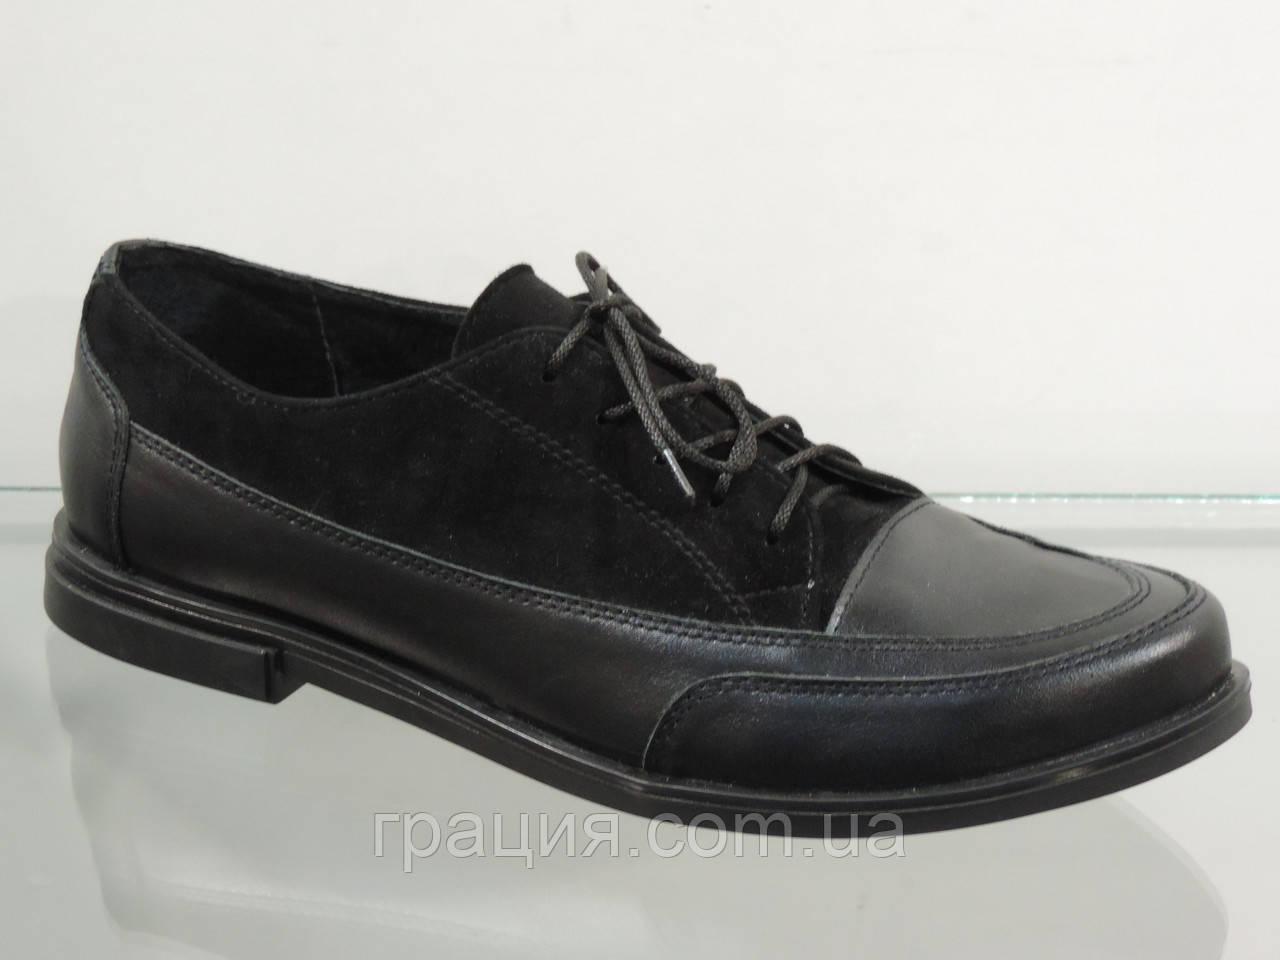 Стильні жіночі туфлі на шнурках шкіра/замша натуральна